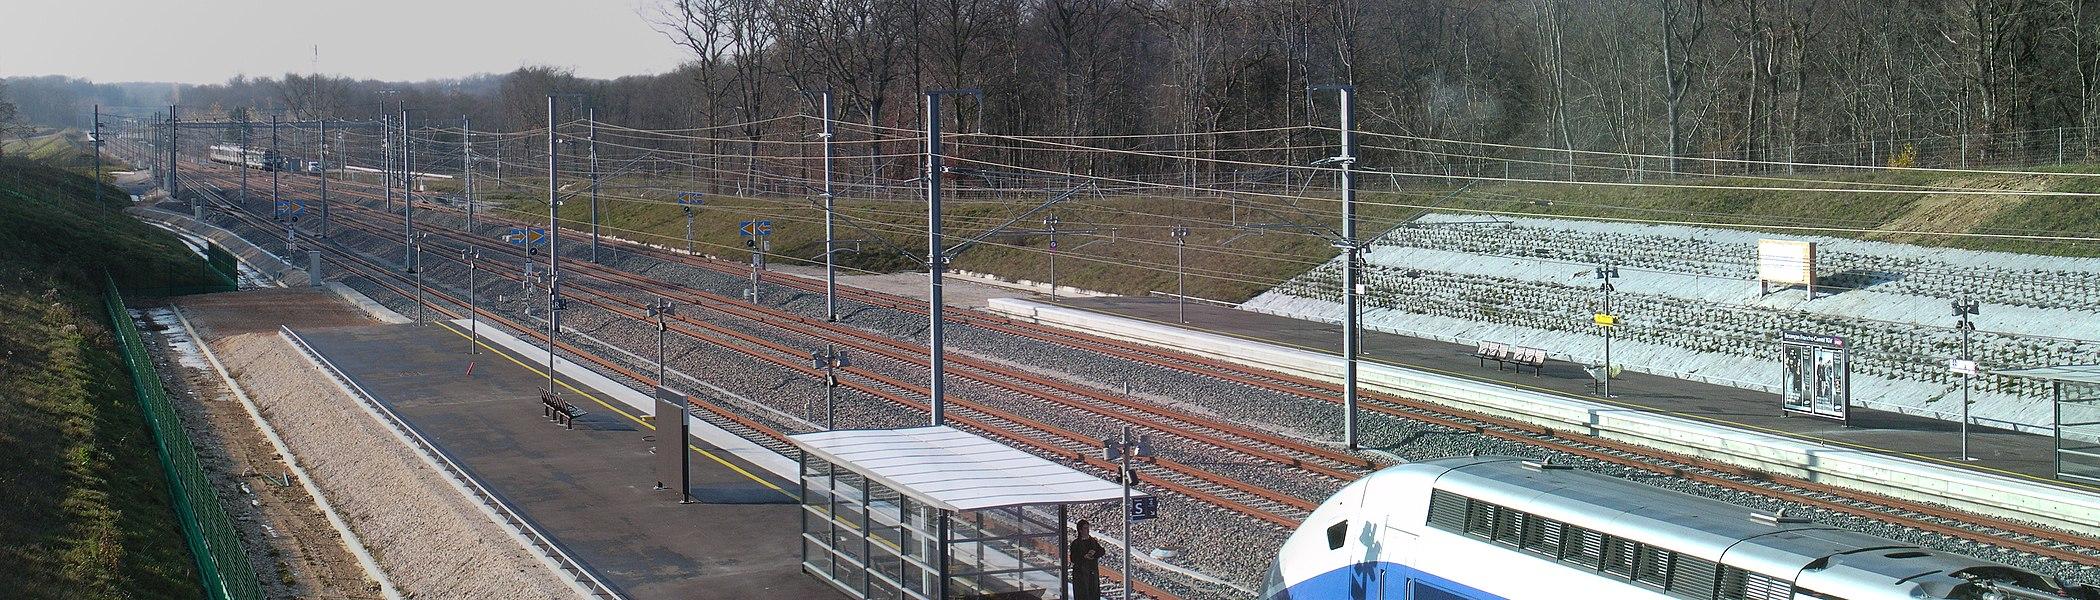 LGV Rhin-Rhône high-speed railway line toward Dijon, seen from the Besançon Franche-Comté TGV railway station during station's inaugural.